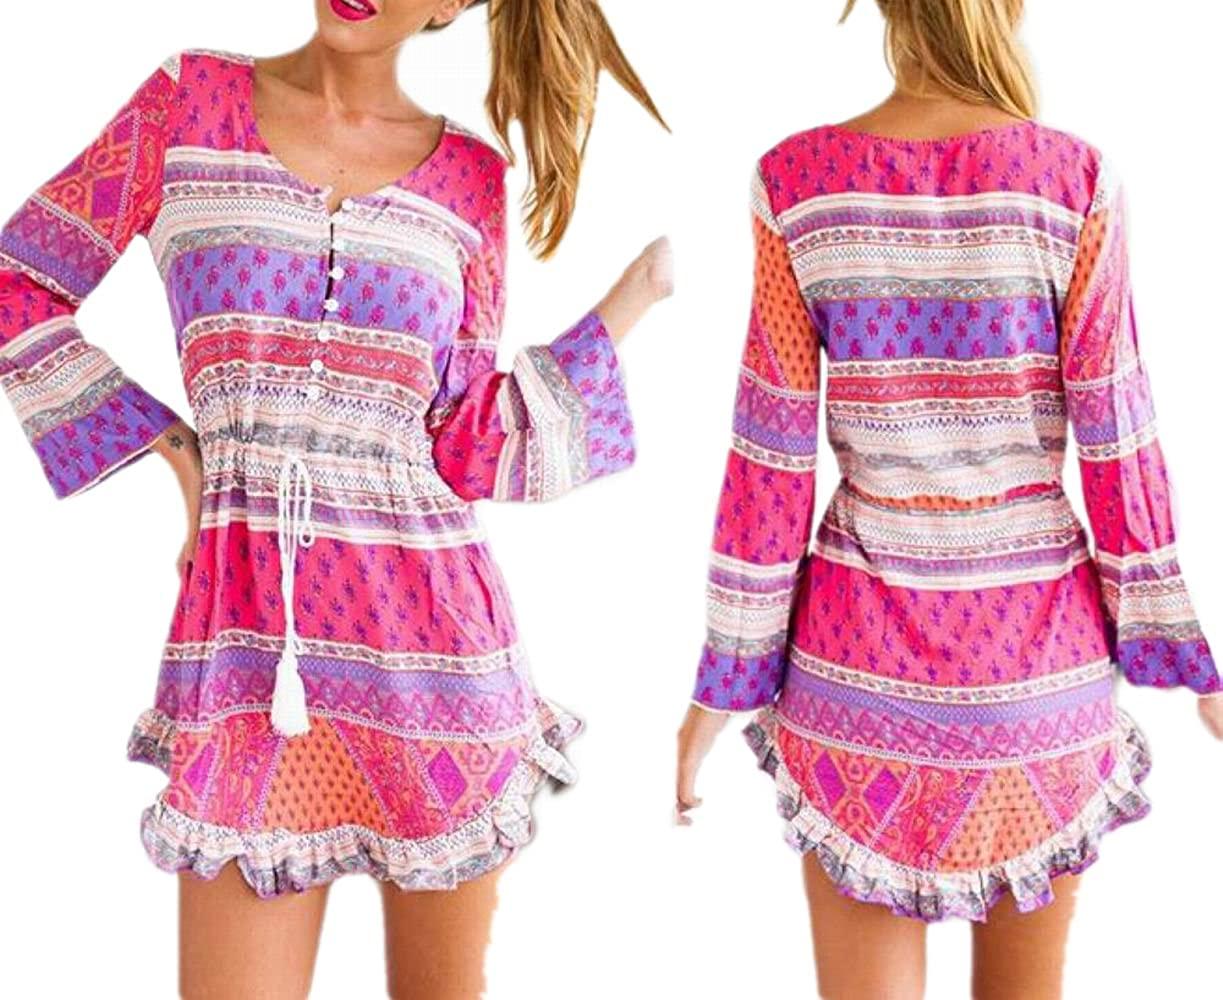 JJ-GOGO Printing Round Neck Long-Sleeved Sexy Women Summer Dress